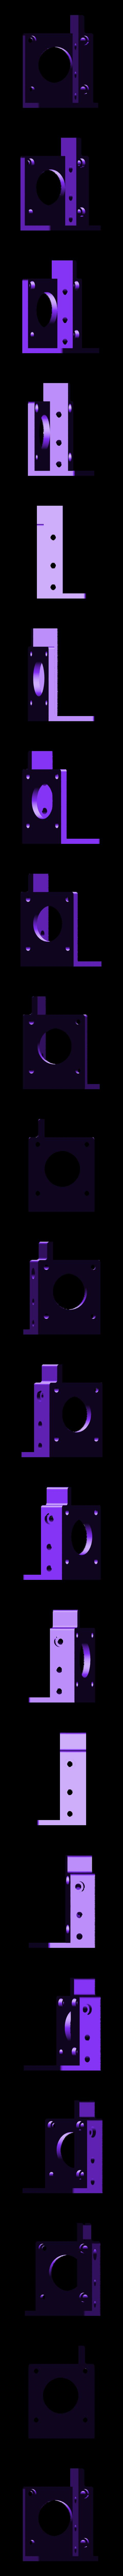 Extruder_main_body.stl Download free STL file Portable 3D Printer • 3D printable design, Job